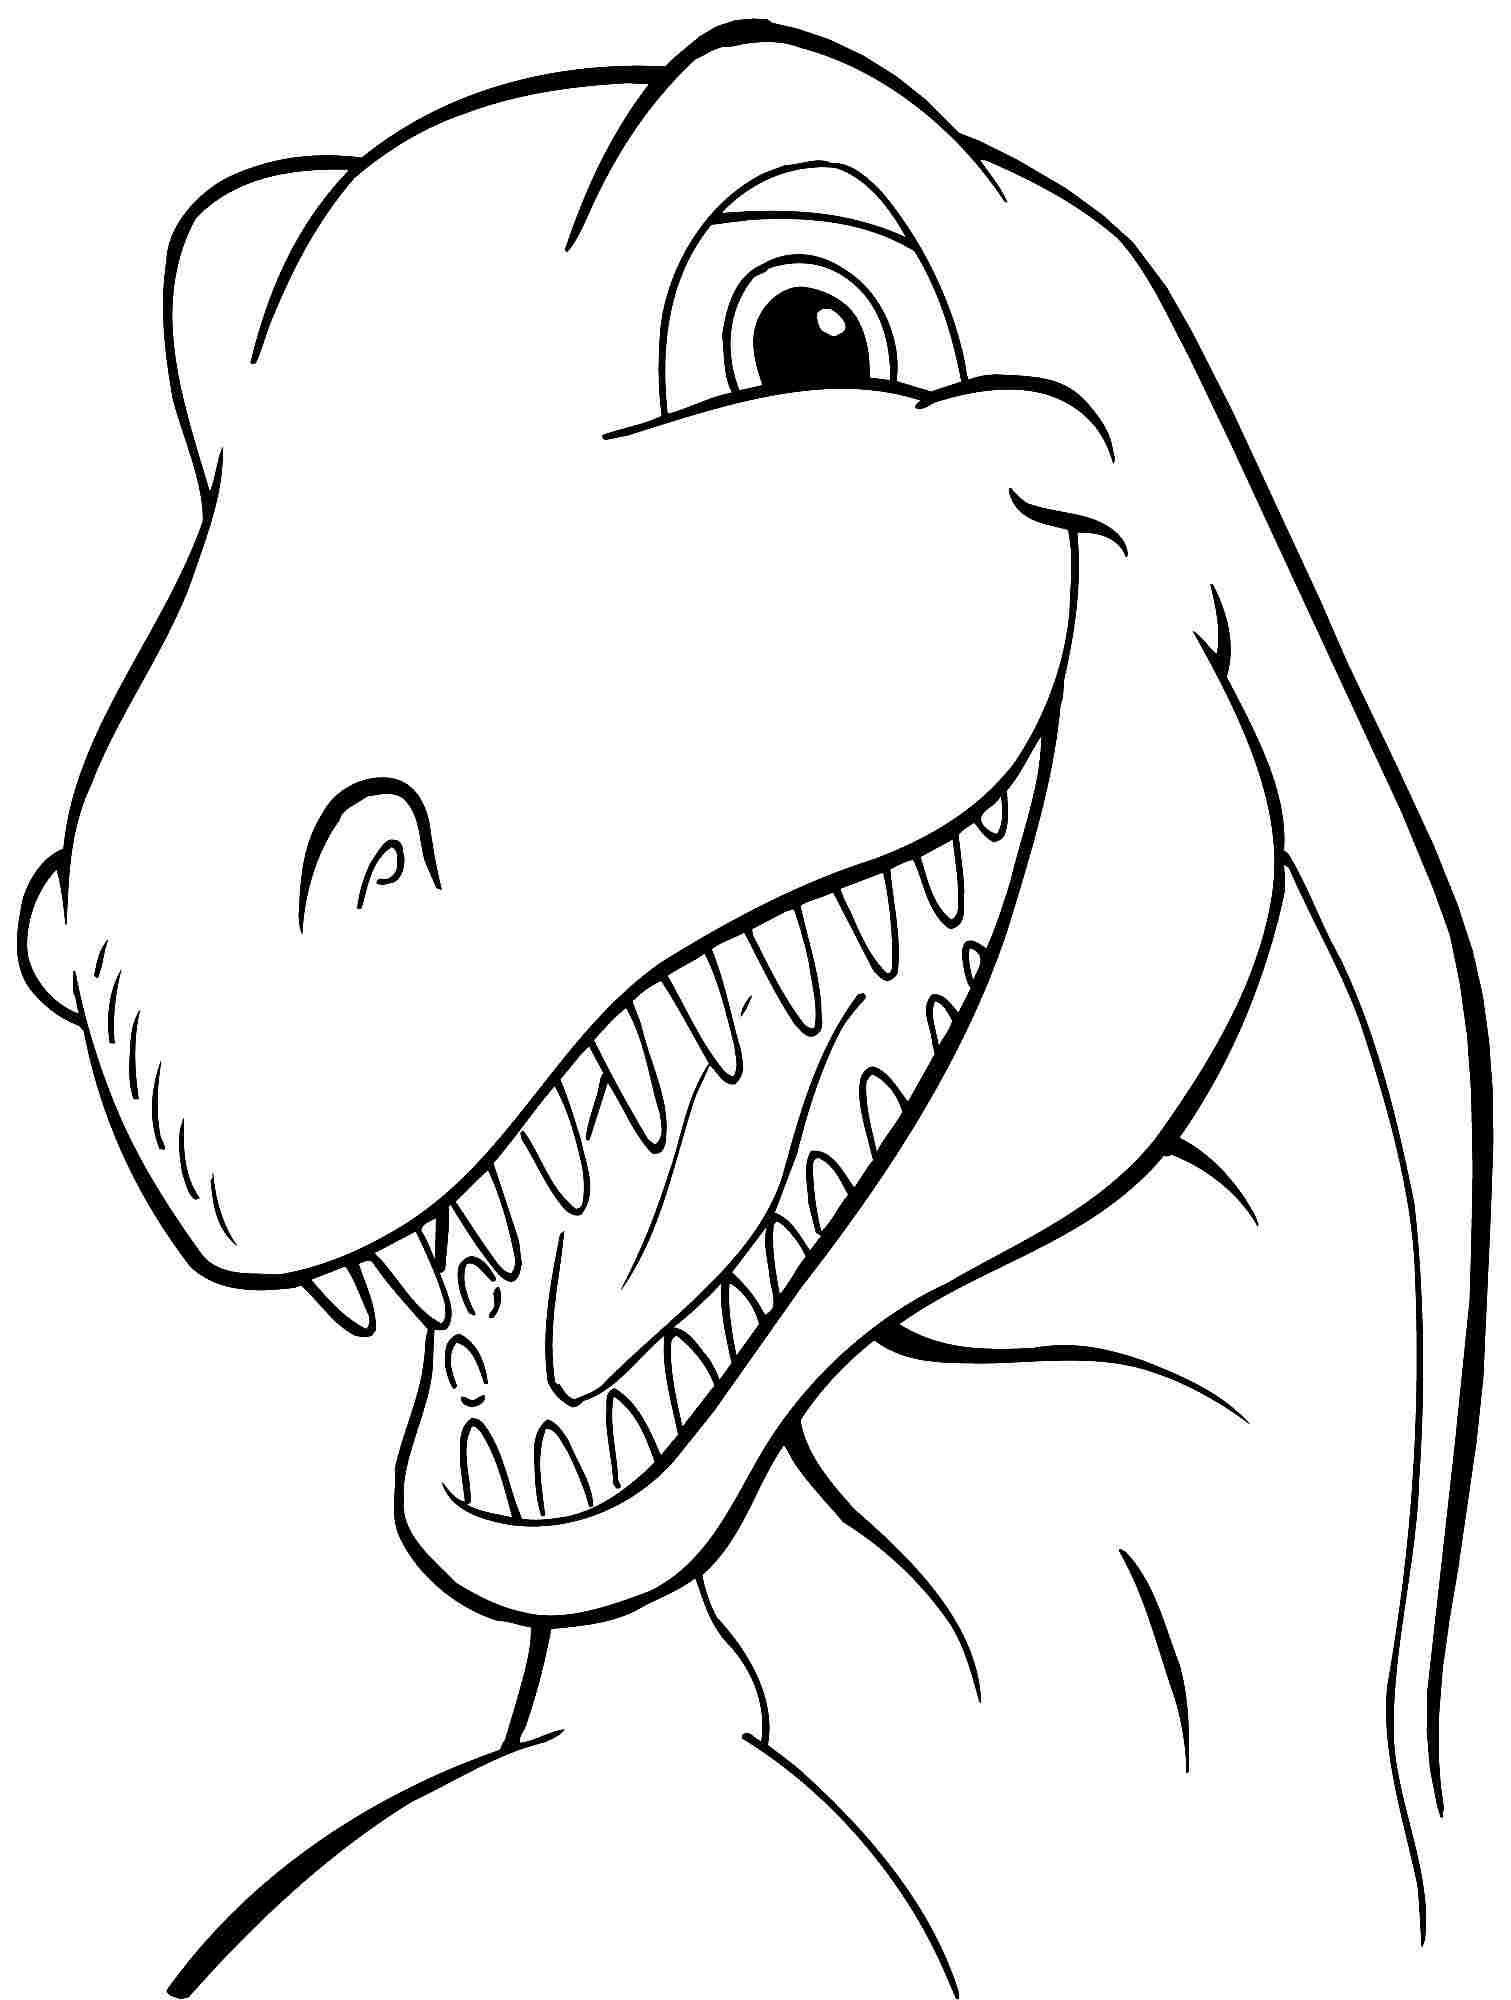 Animal Dinosaurs Tyrannosaurus Rex Coloring Sheets Free Printable For Kids Girls 22167 Dinosaur Coloring Pages Dinosaur Coloring Sheets Puppy Coloring Pages